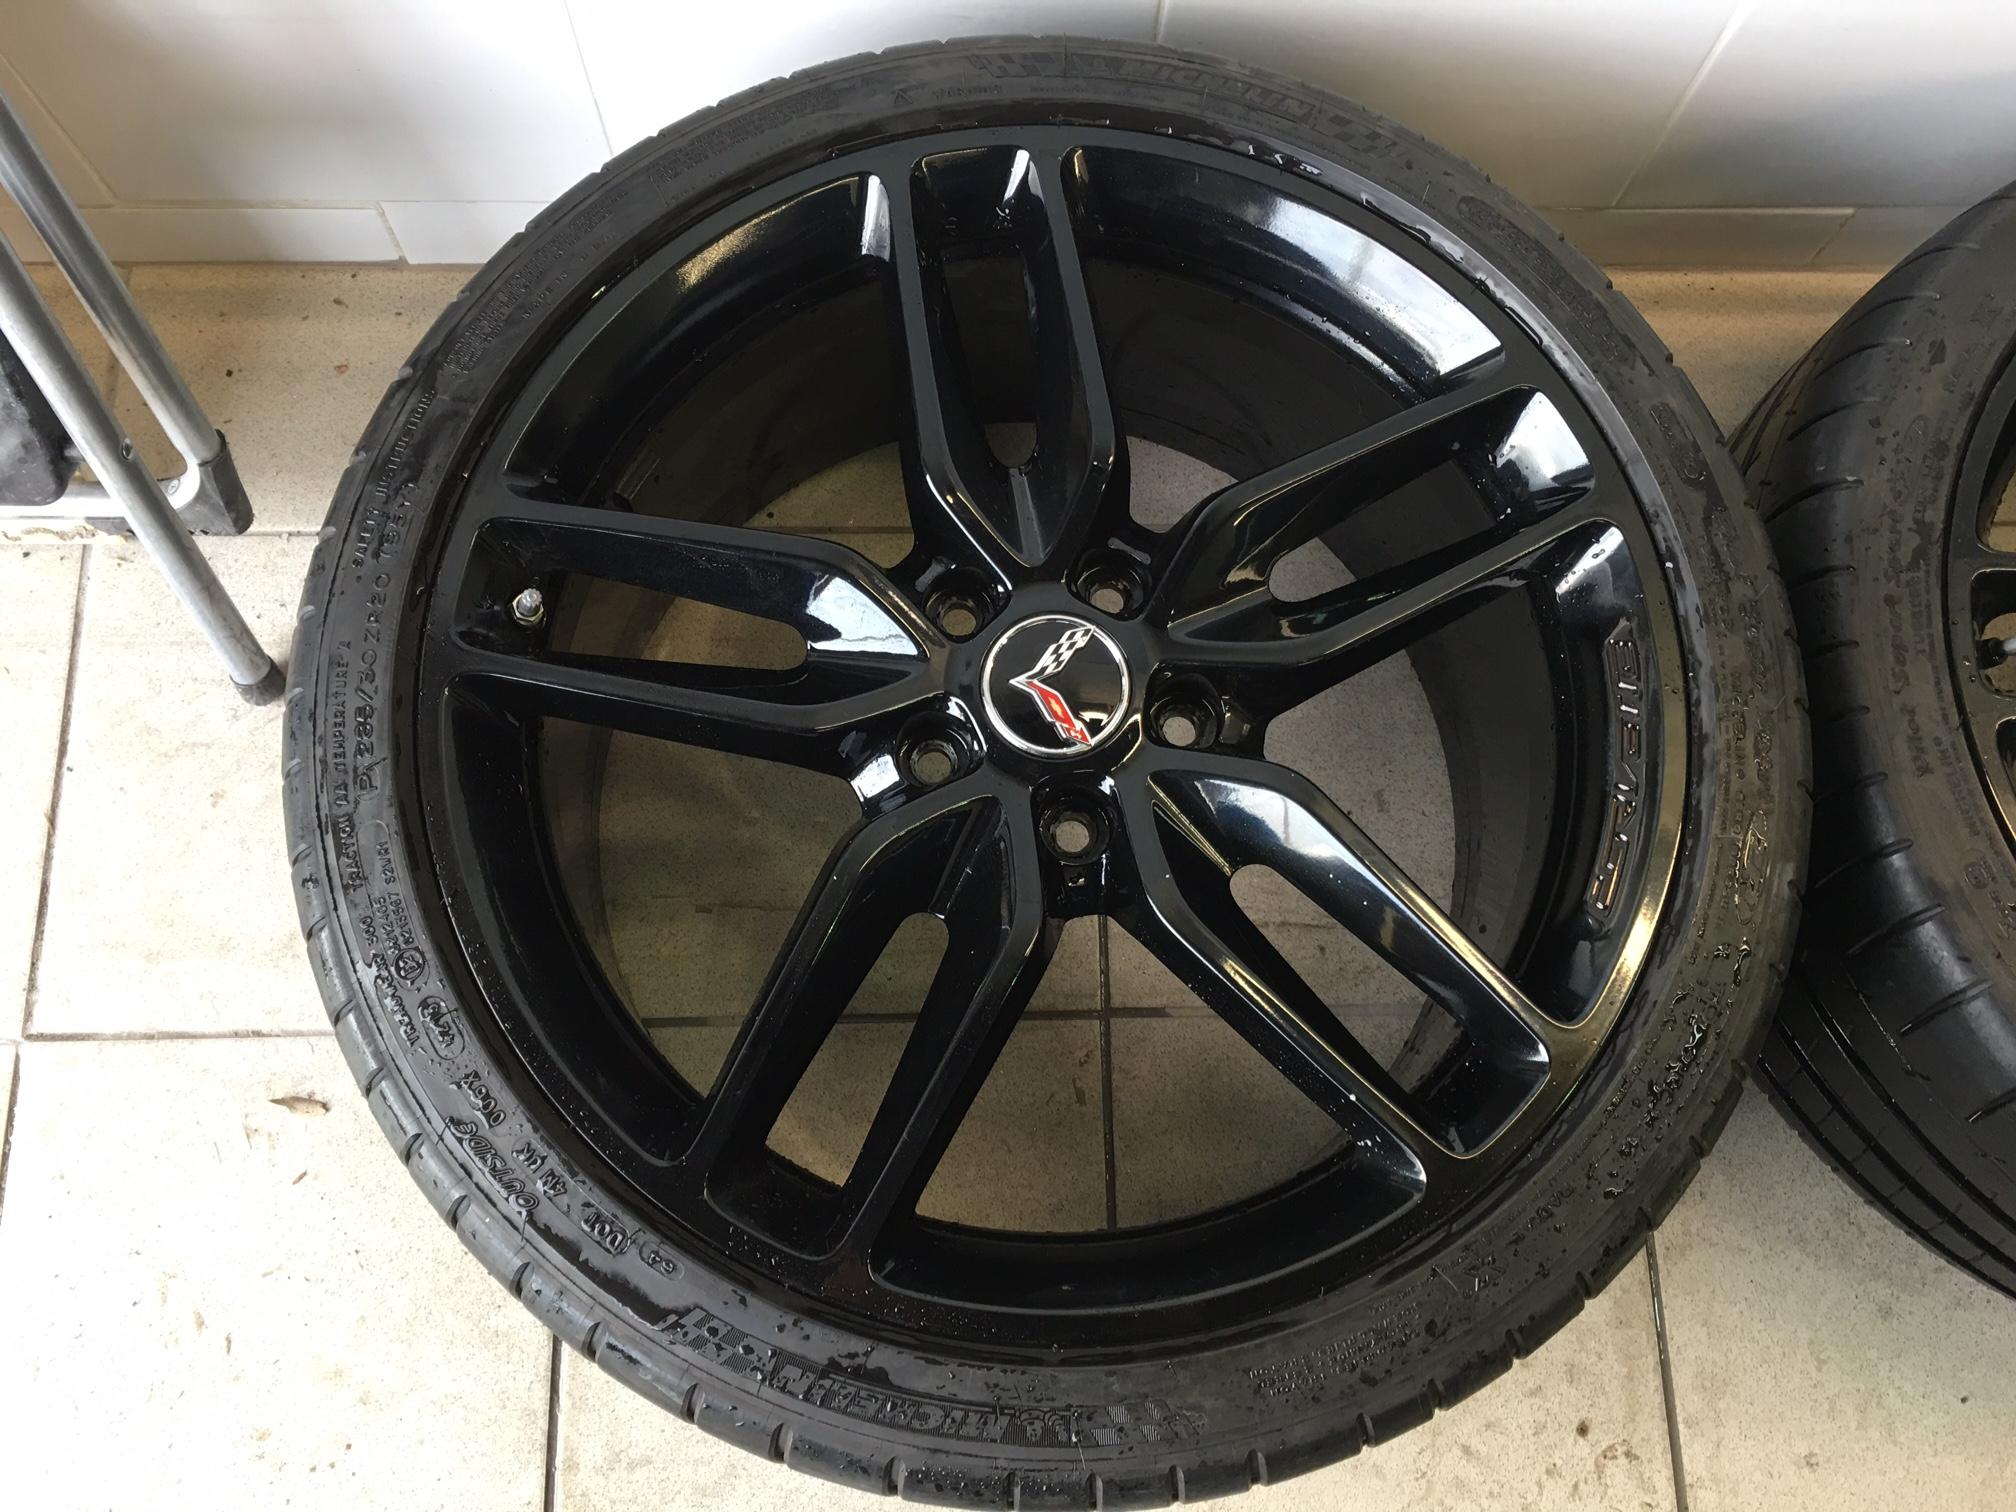 sold factory z51 black wheels michelin pilot super sport zp tires. Black Bedroom Furniture Sets. Home Design Ideas